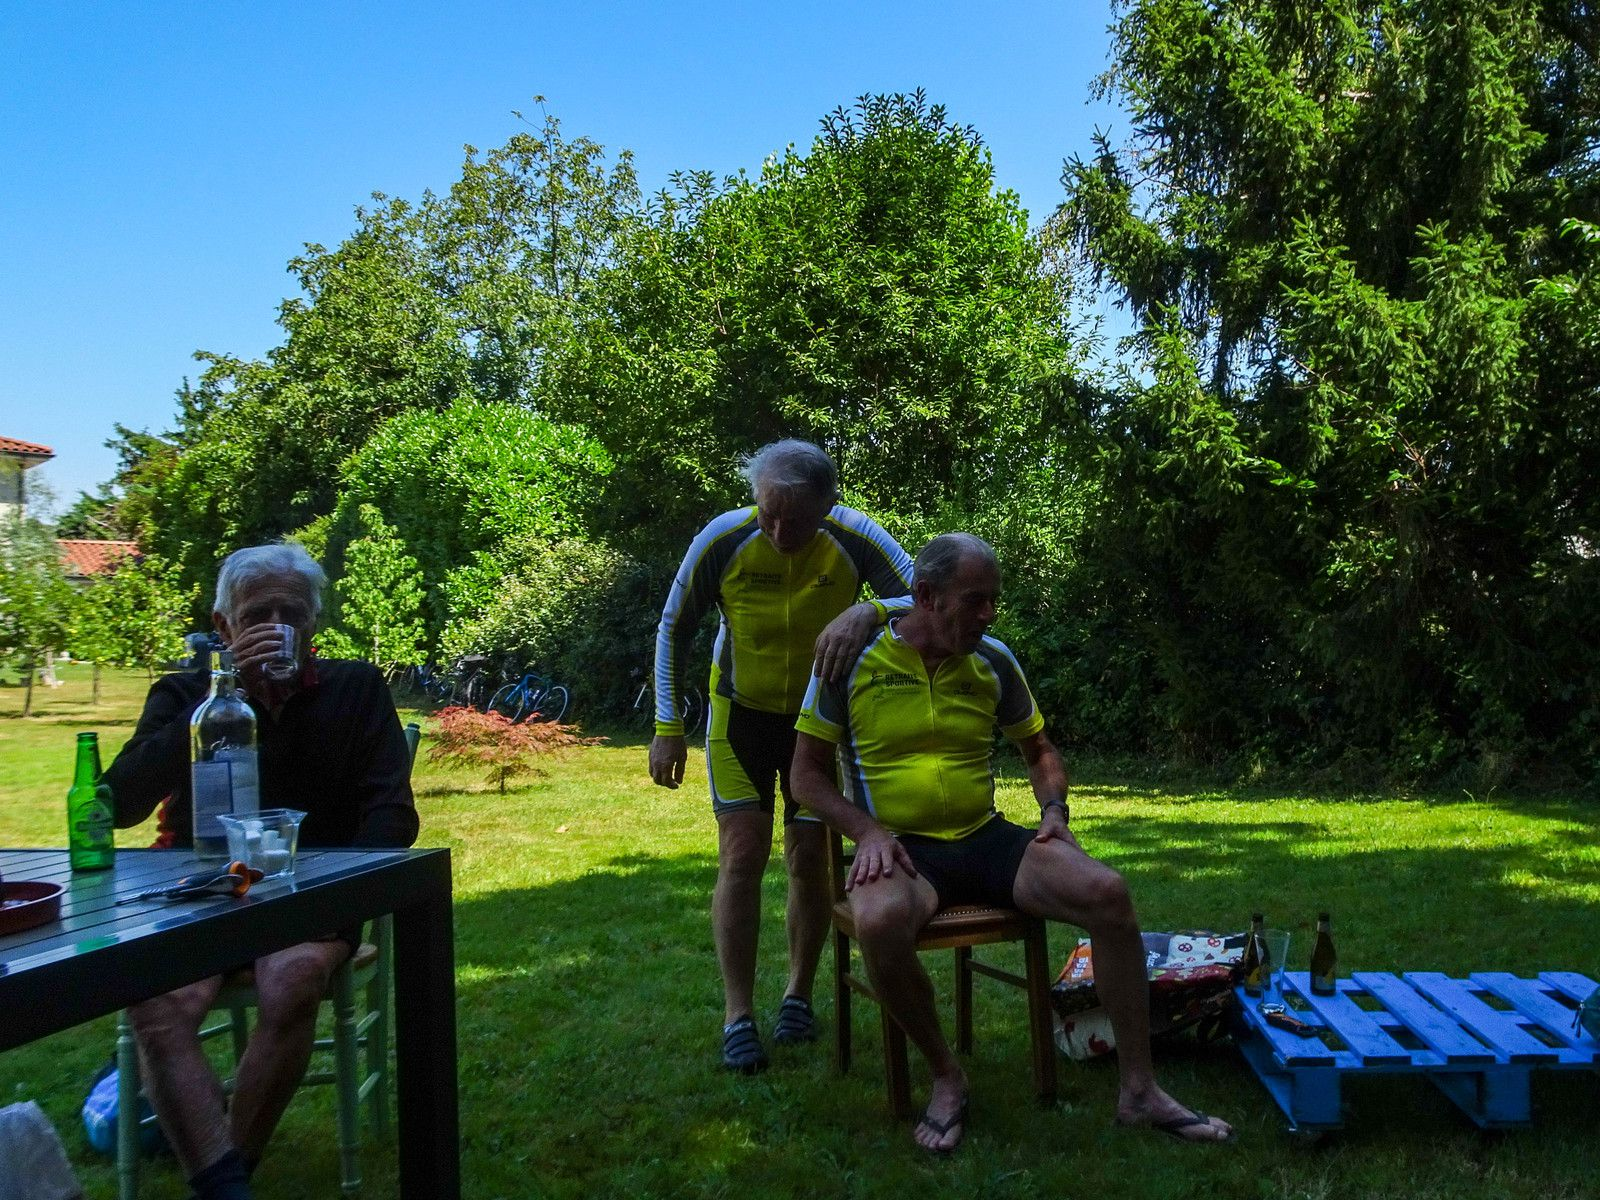 St Pierre de Chandieu - P1 - Jeudi23 juillet 2020